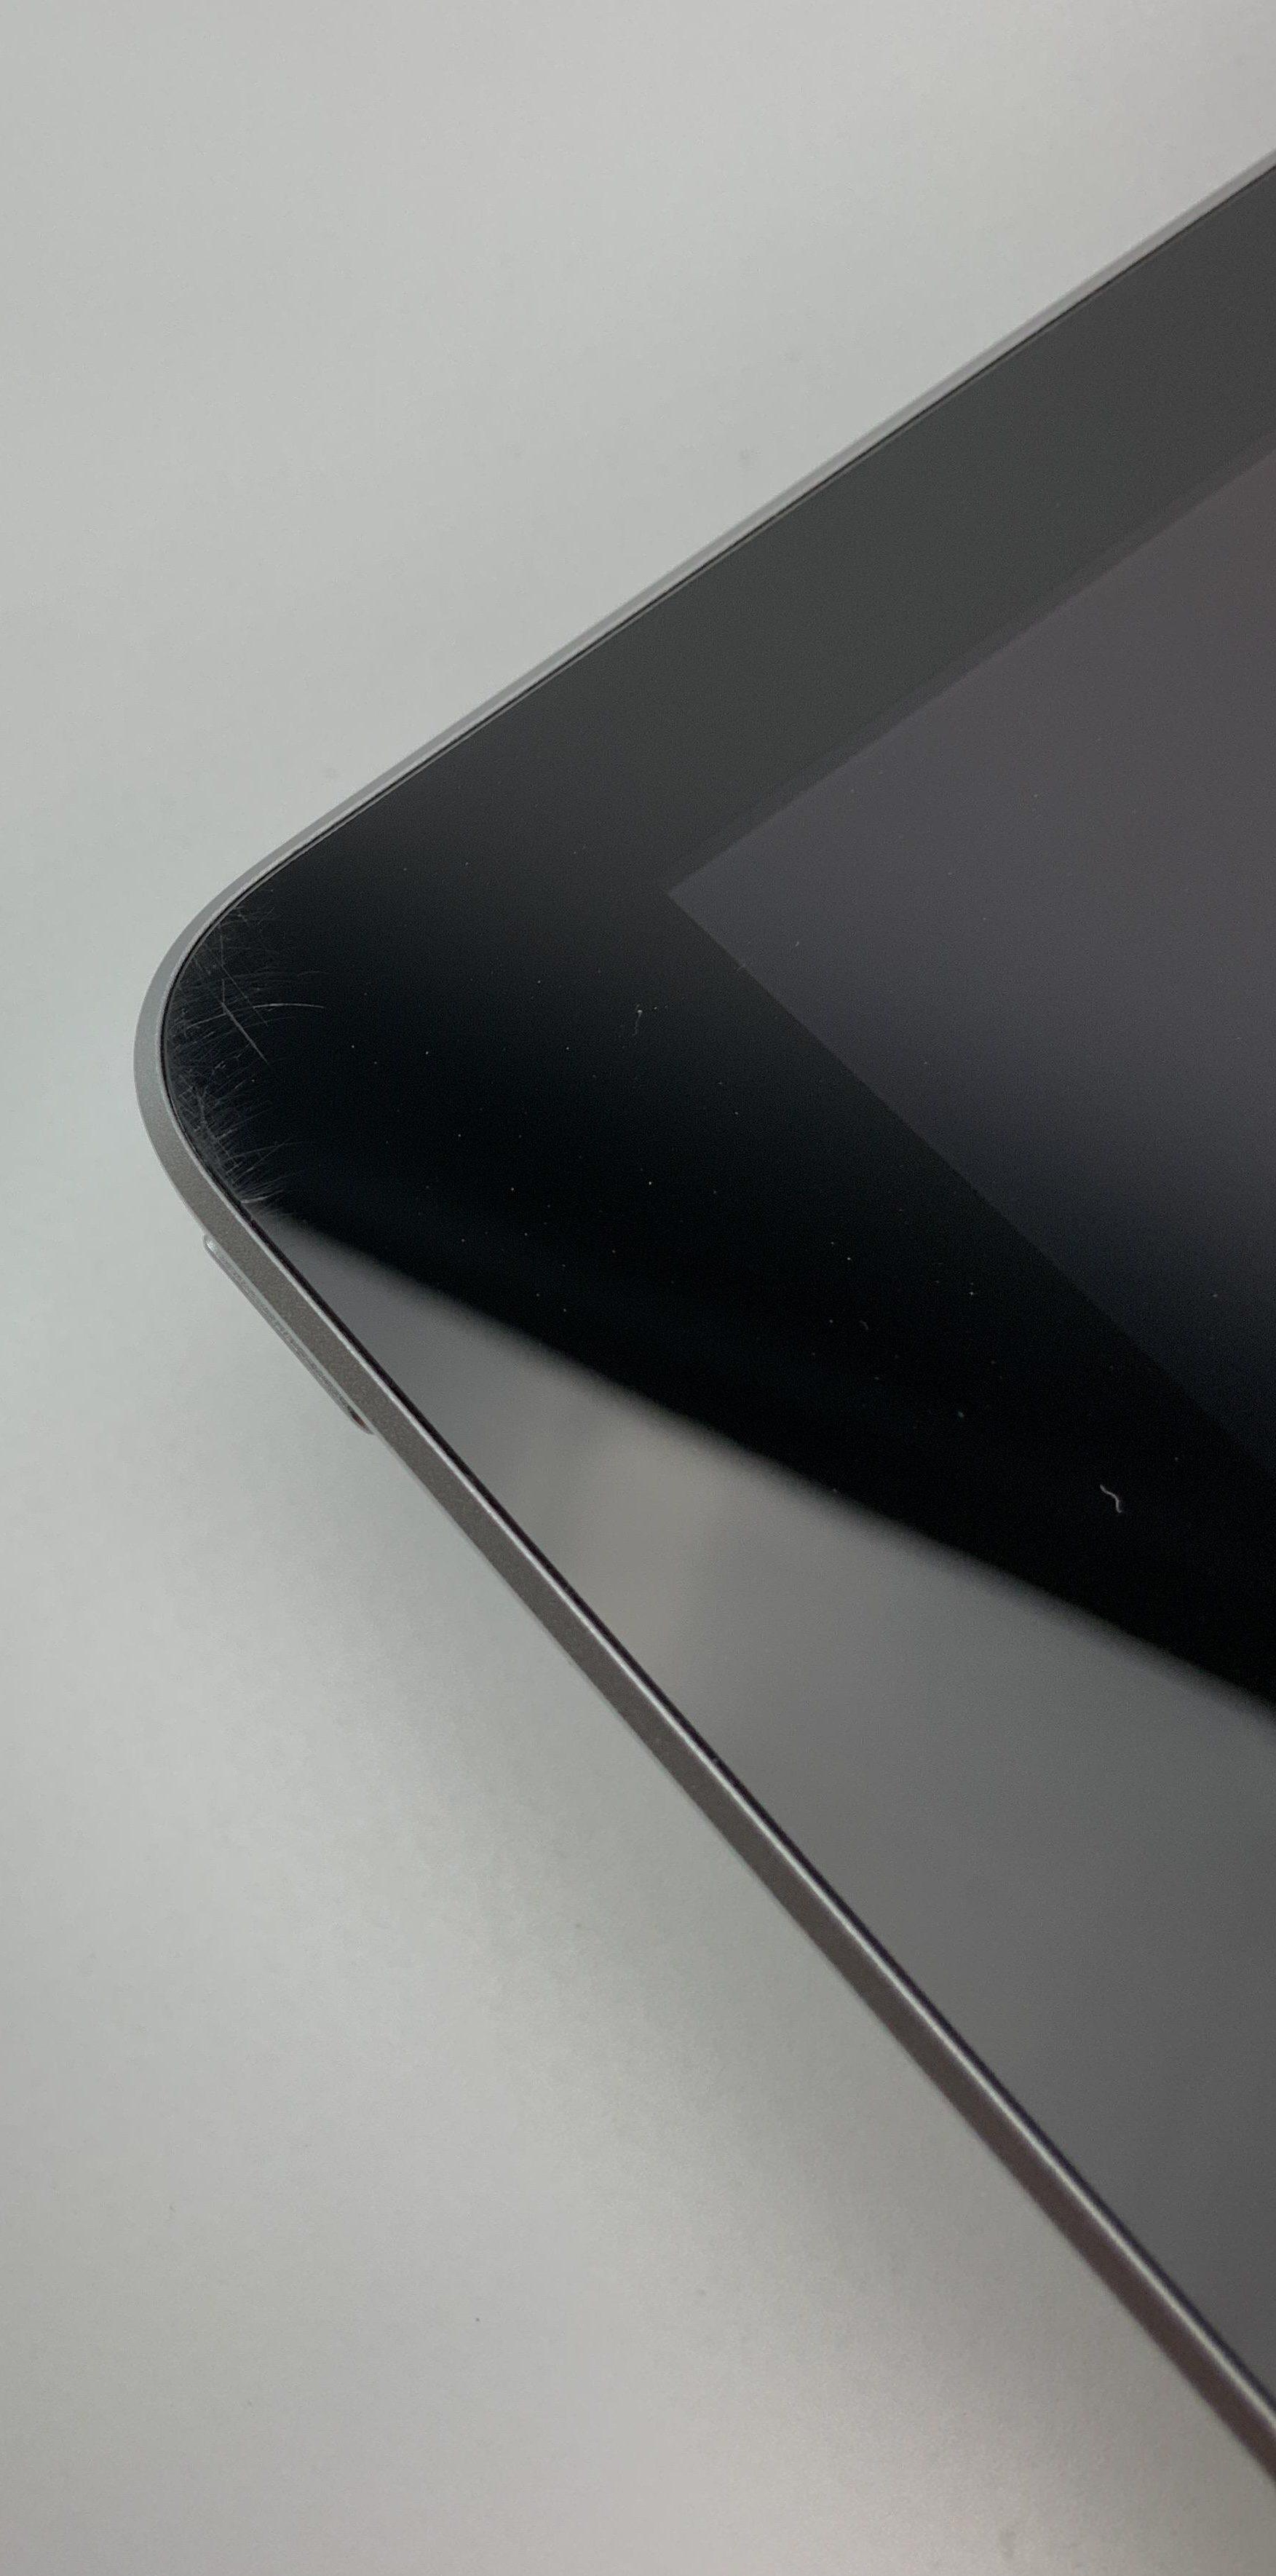 iPad 6 Wi-Fi 128GB, 128GB, Space Gray, Kuva 4